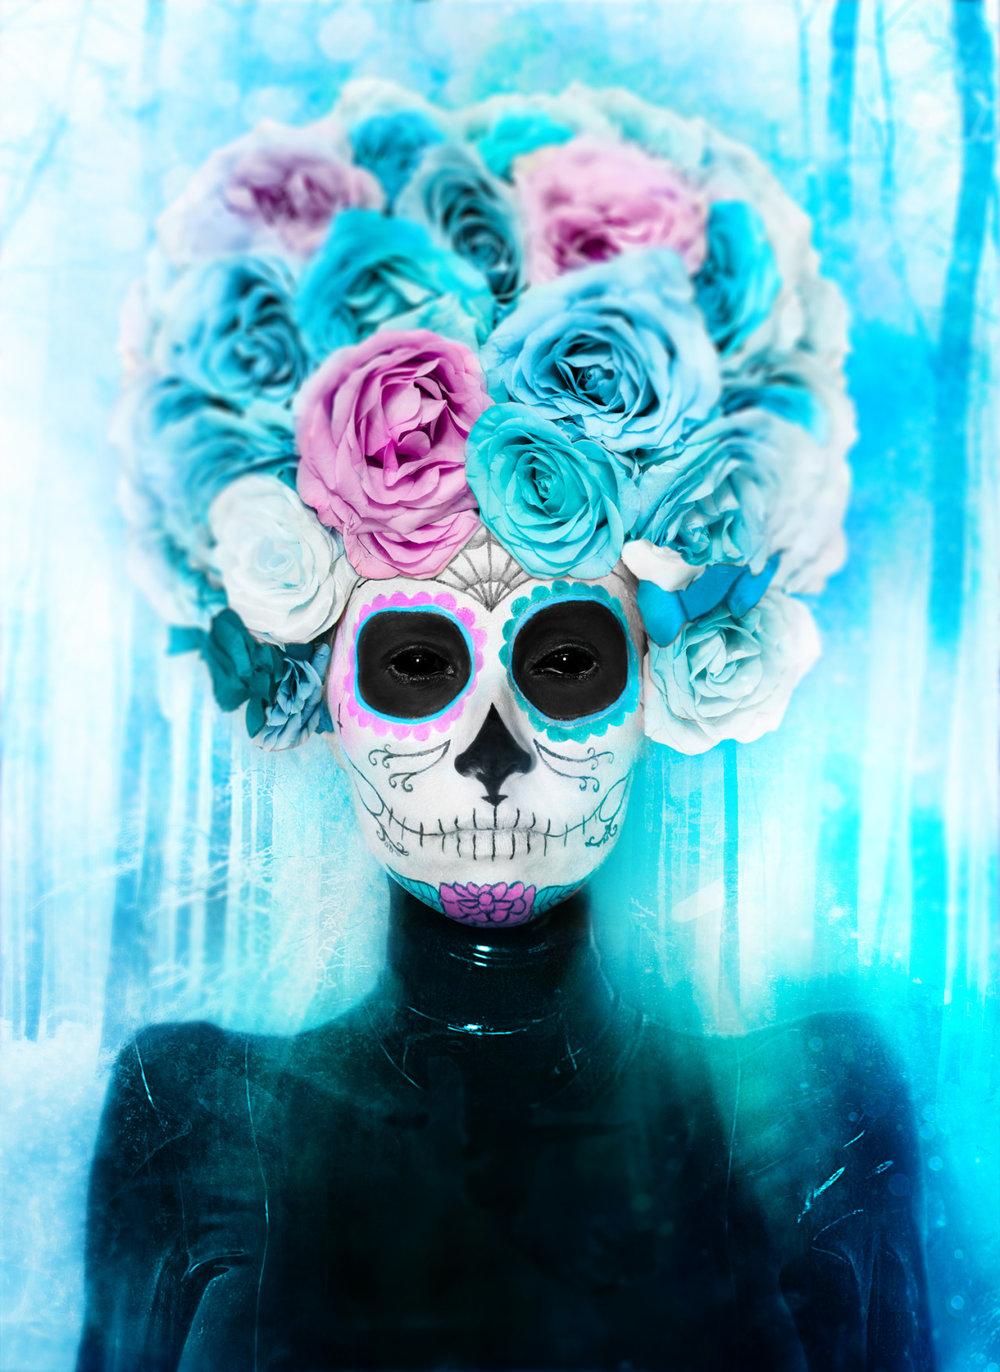 LA NIEVE REINA DE LOS MUERTOS    Translation: Snow Queen Of The Dead    Photography & Art Direction  -  BRYAN BARNES   Model  - A •  Makeup  - KIM MYERS •  Haute Rose Headwear  - Caley Johnson    BBKUNST.com